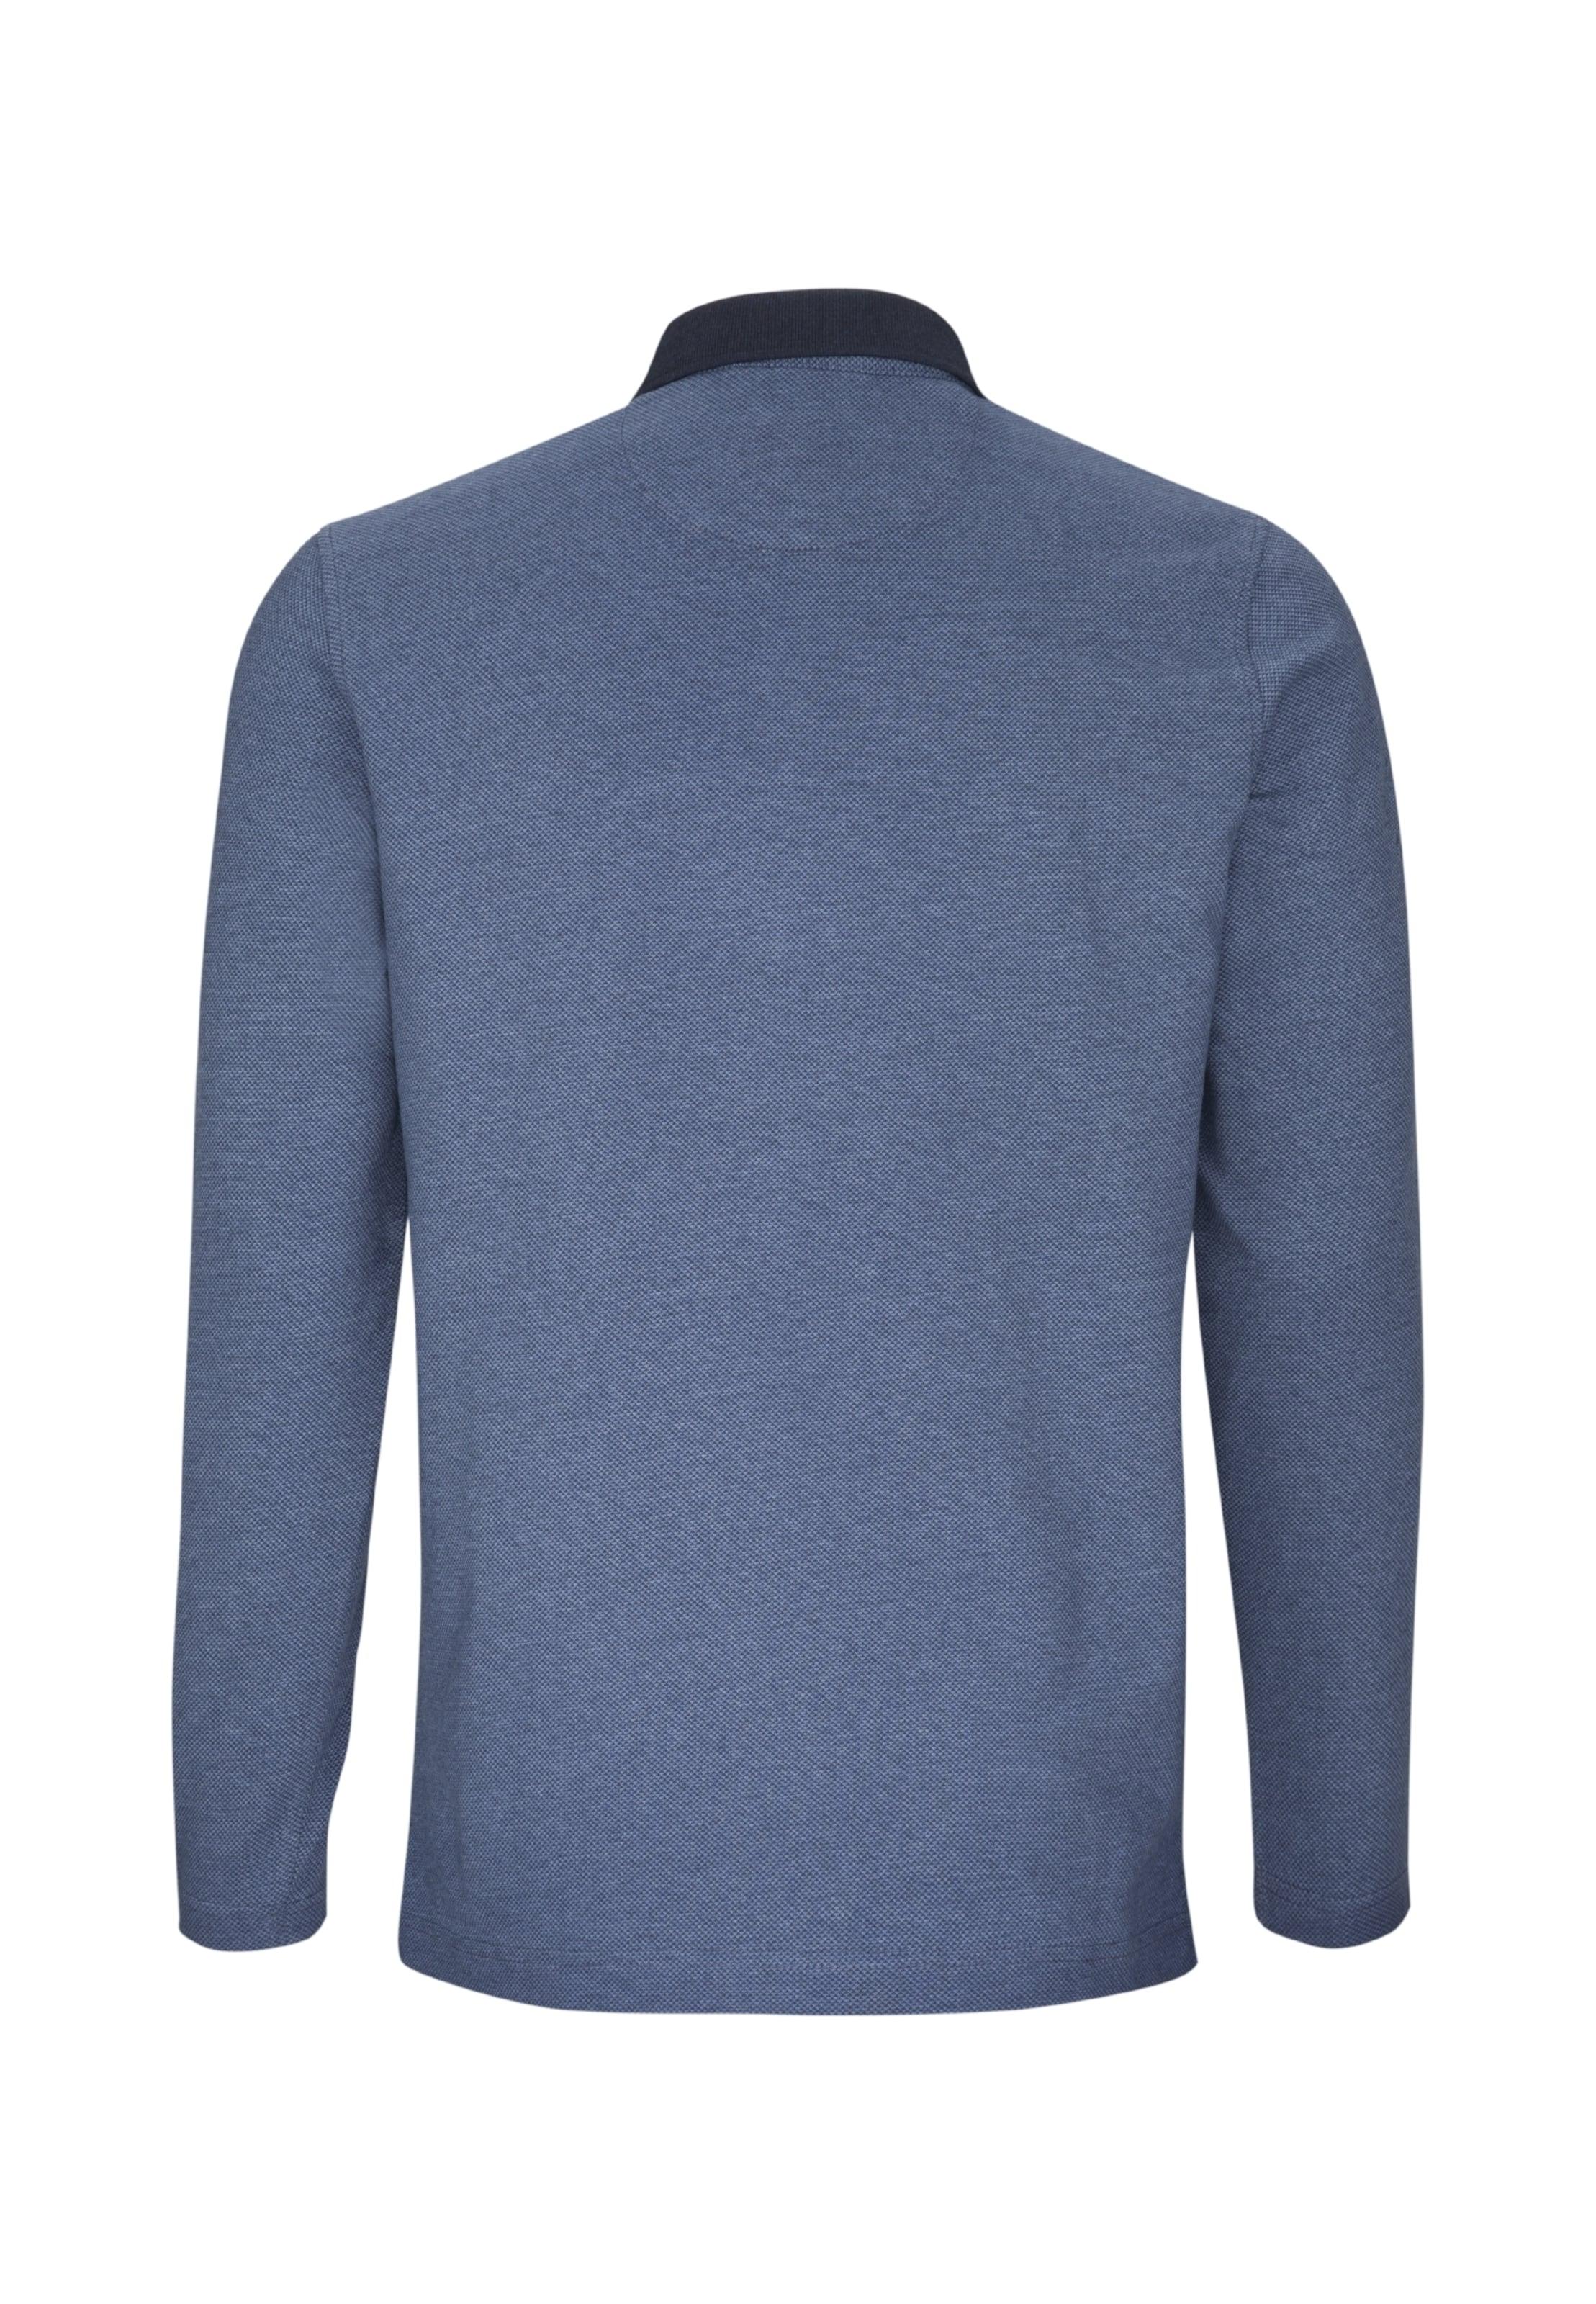 Camel ' BlauSchwarz shirt In Active Polo mN0nv8wO